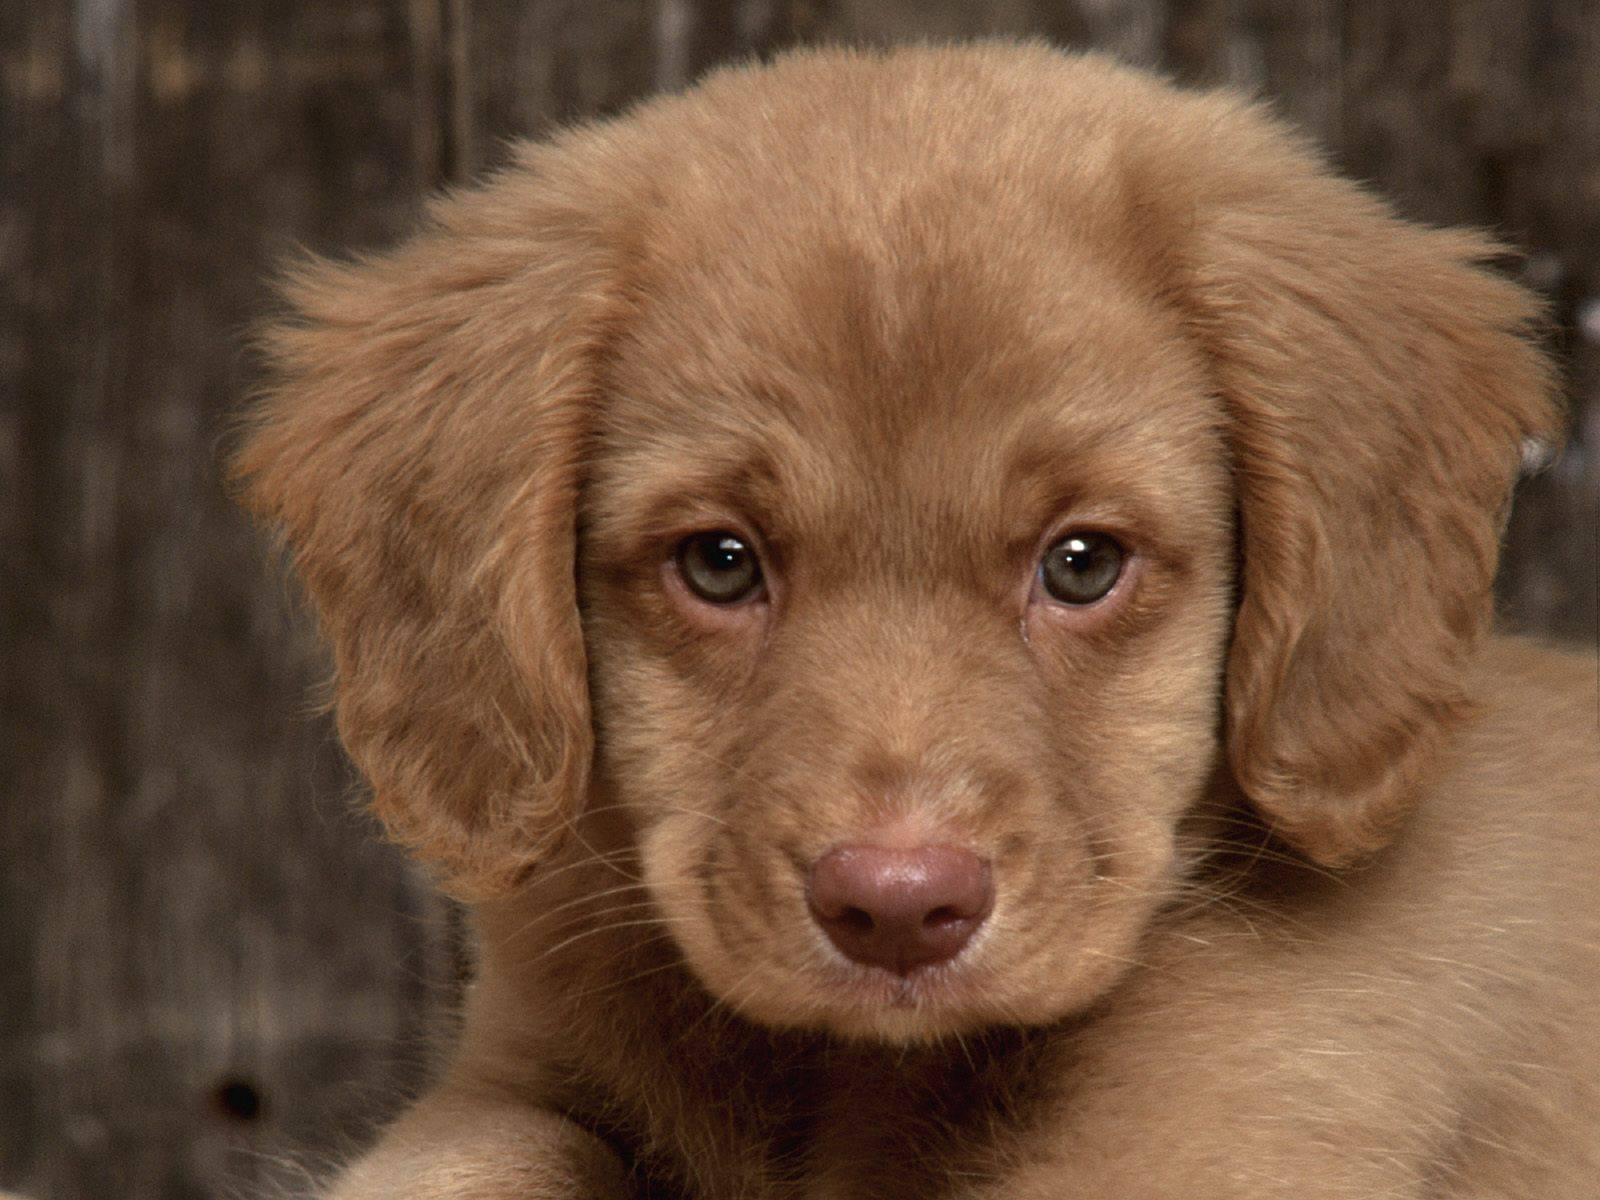 Very cute dog   Dogs Wallpaper 1600x1200